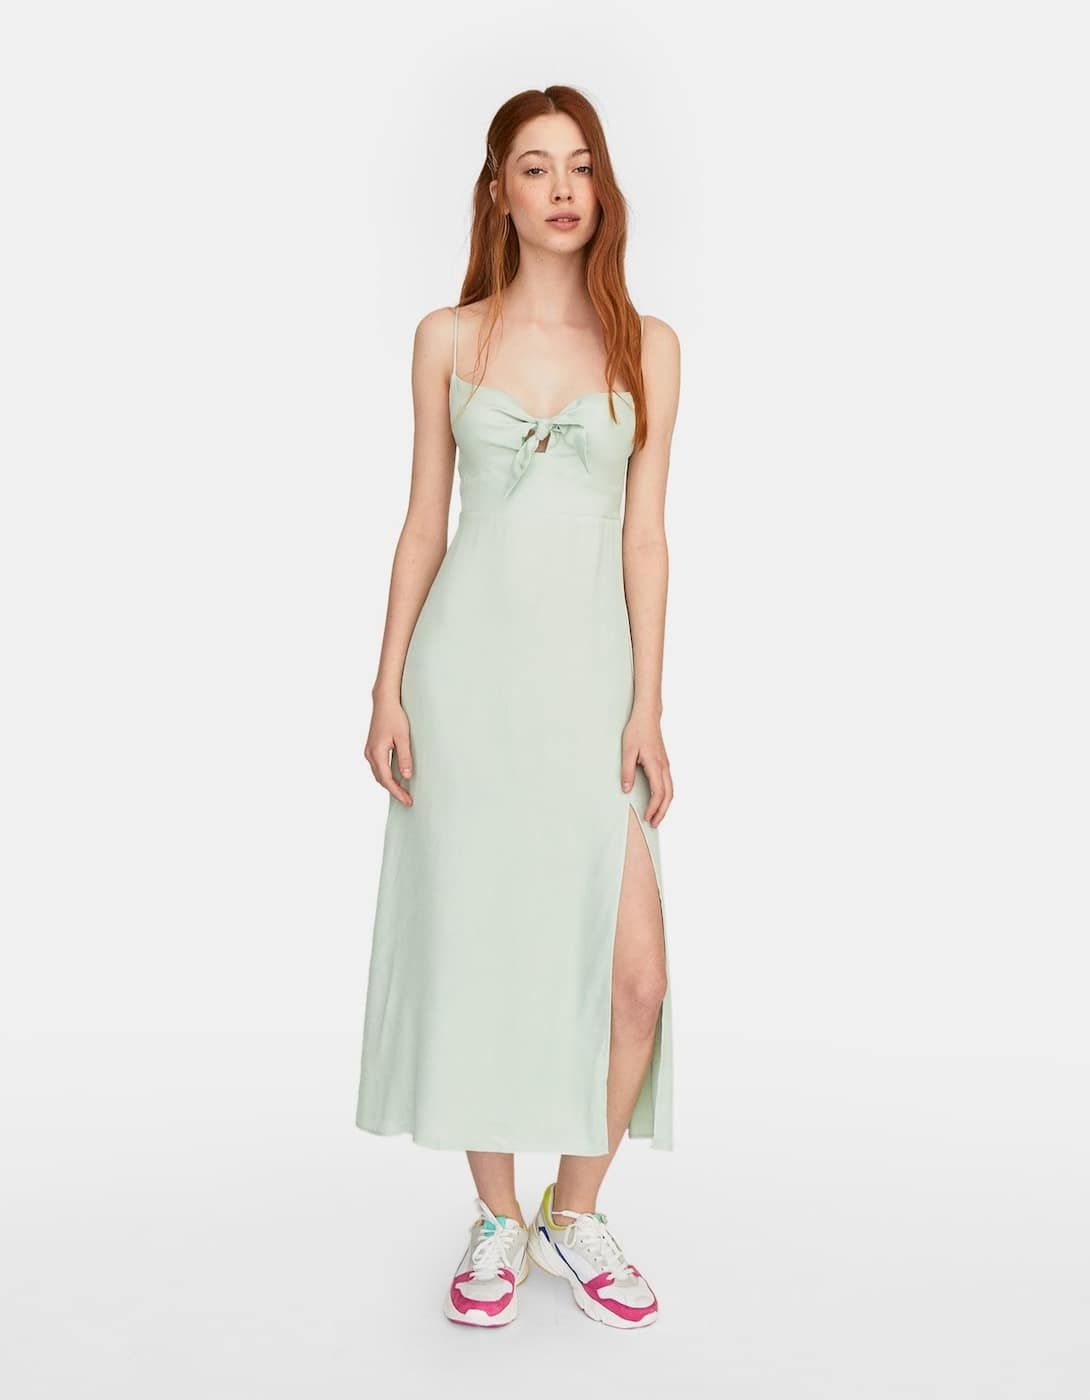 Vestido 2019Inditex Y Mango Lencero DressesWhite En Dress kiuTOZPwXl